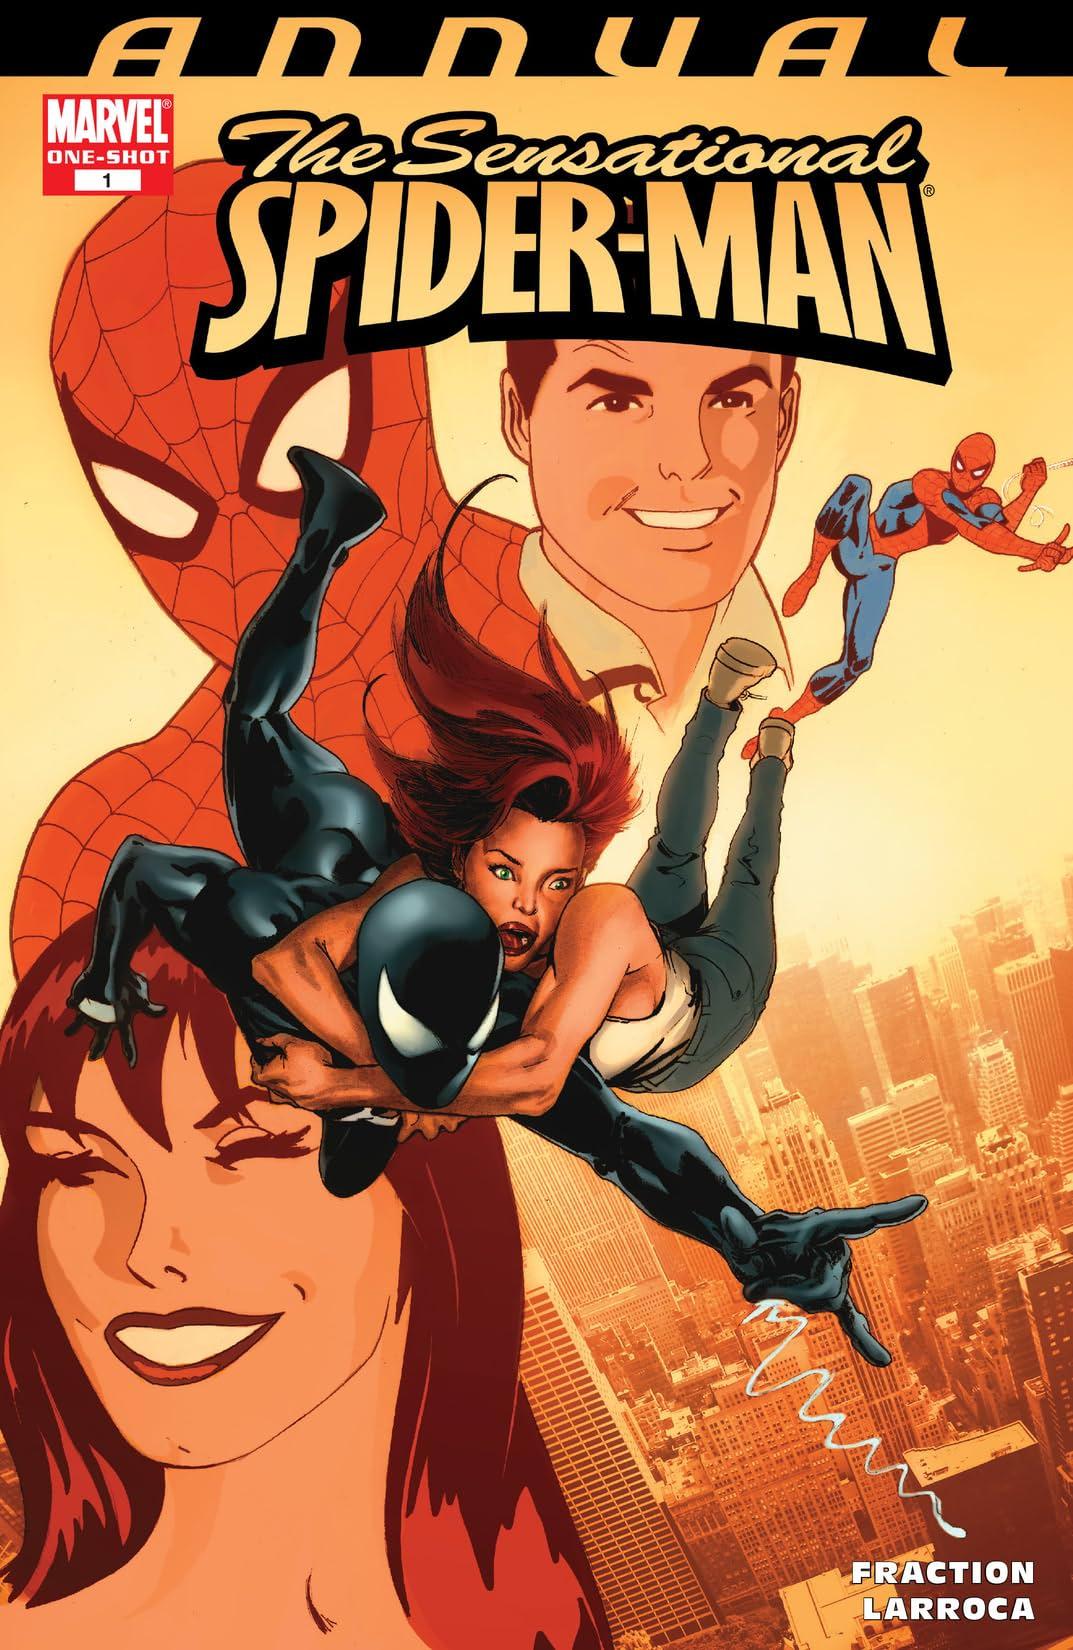 Sensational Spider-Man (2006-2007) Annual #1